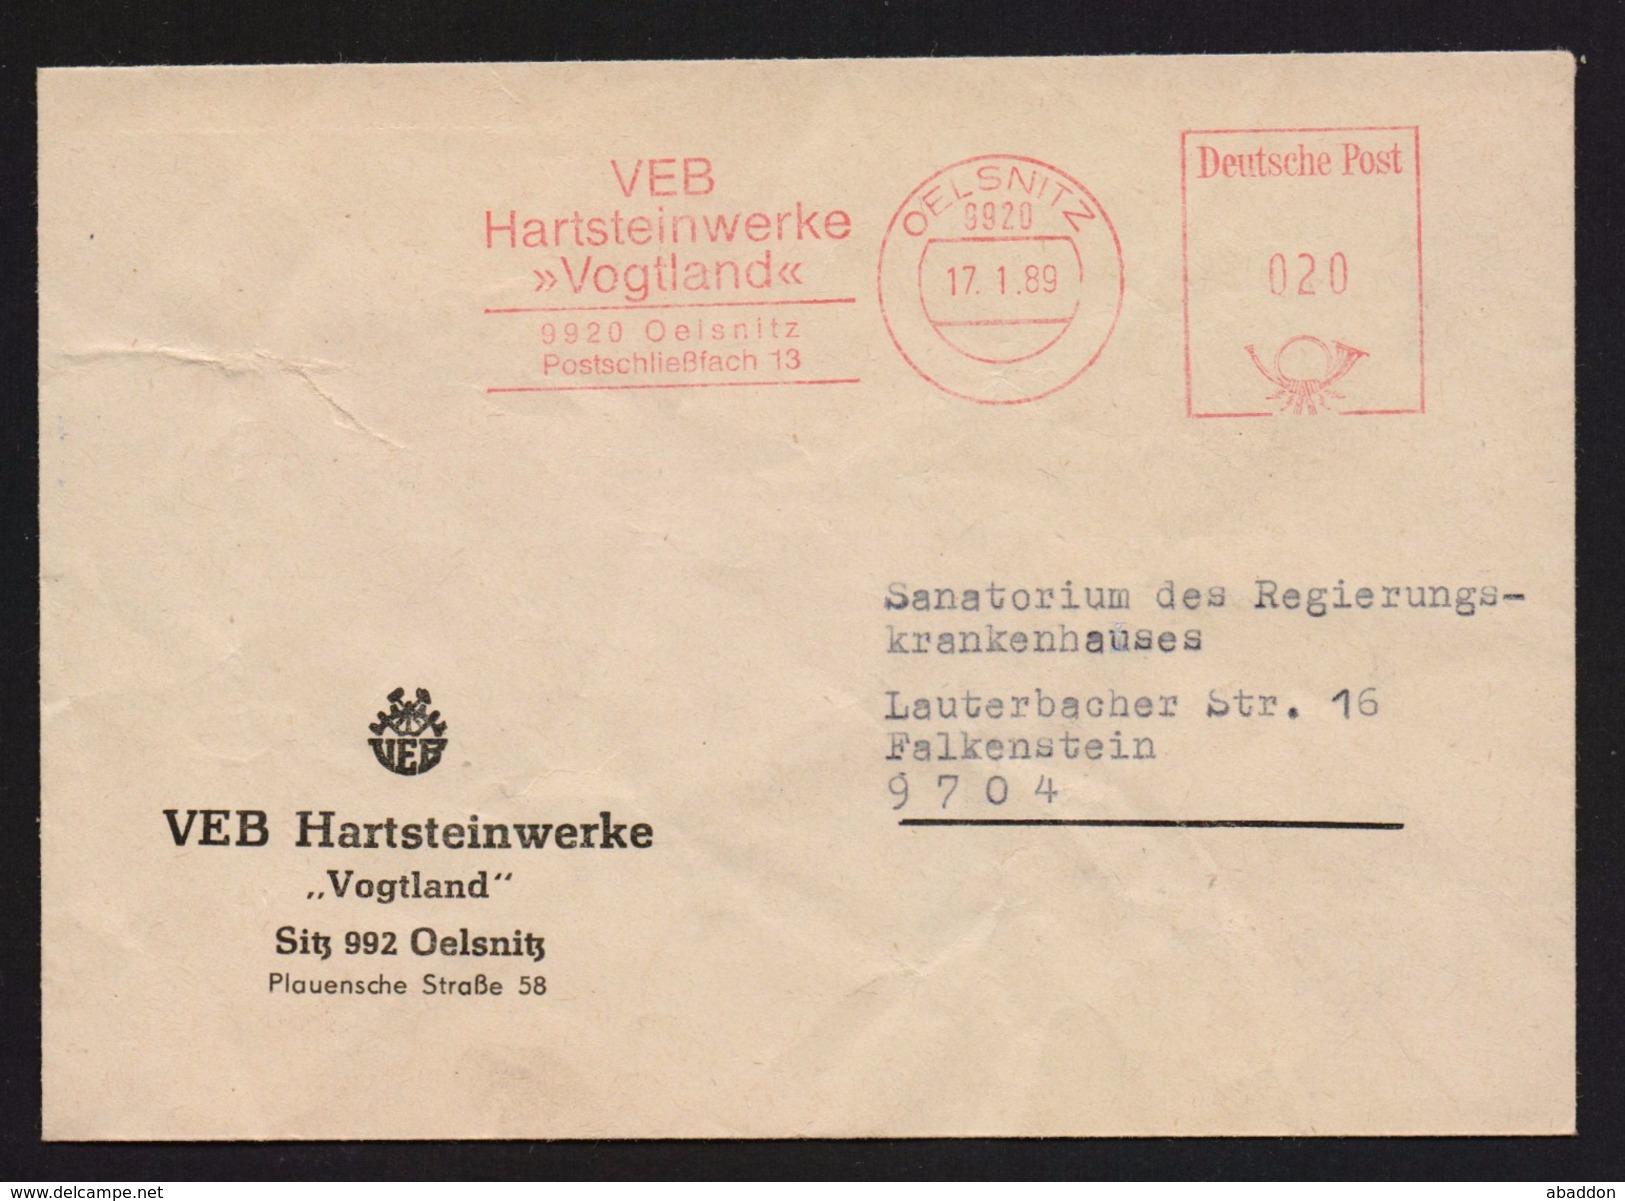 "DDR AFS - VEB Hartsteinwerke ""Vogtland"", OELSNITZ 17.1.89 (88) - DDR"